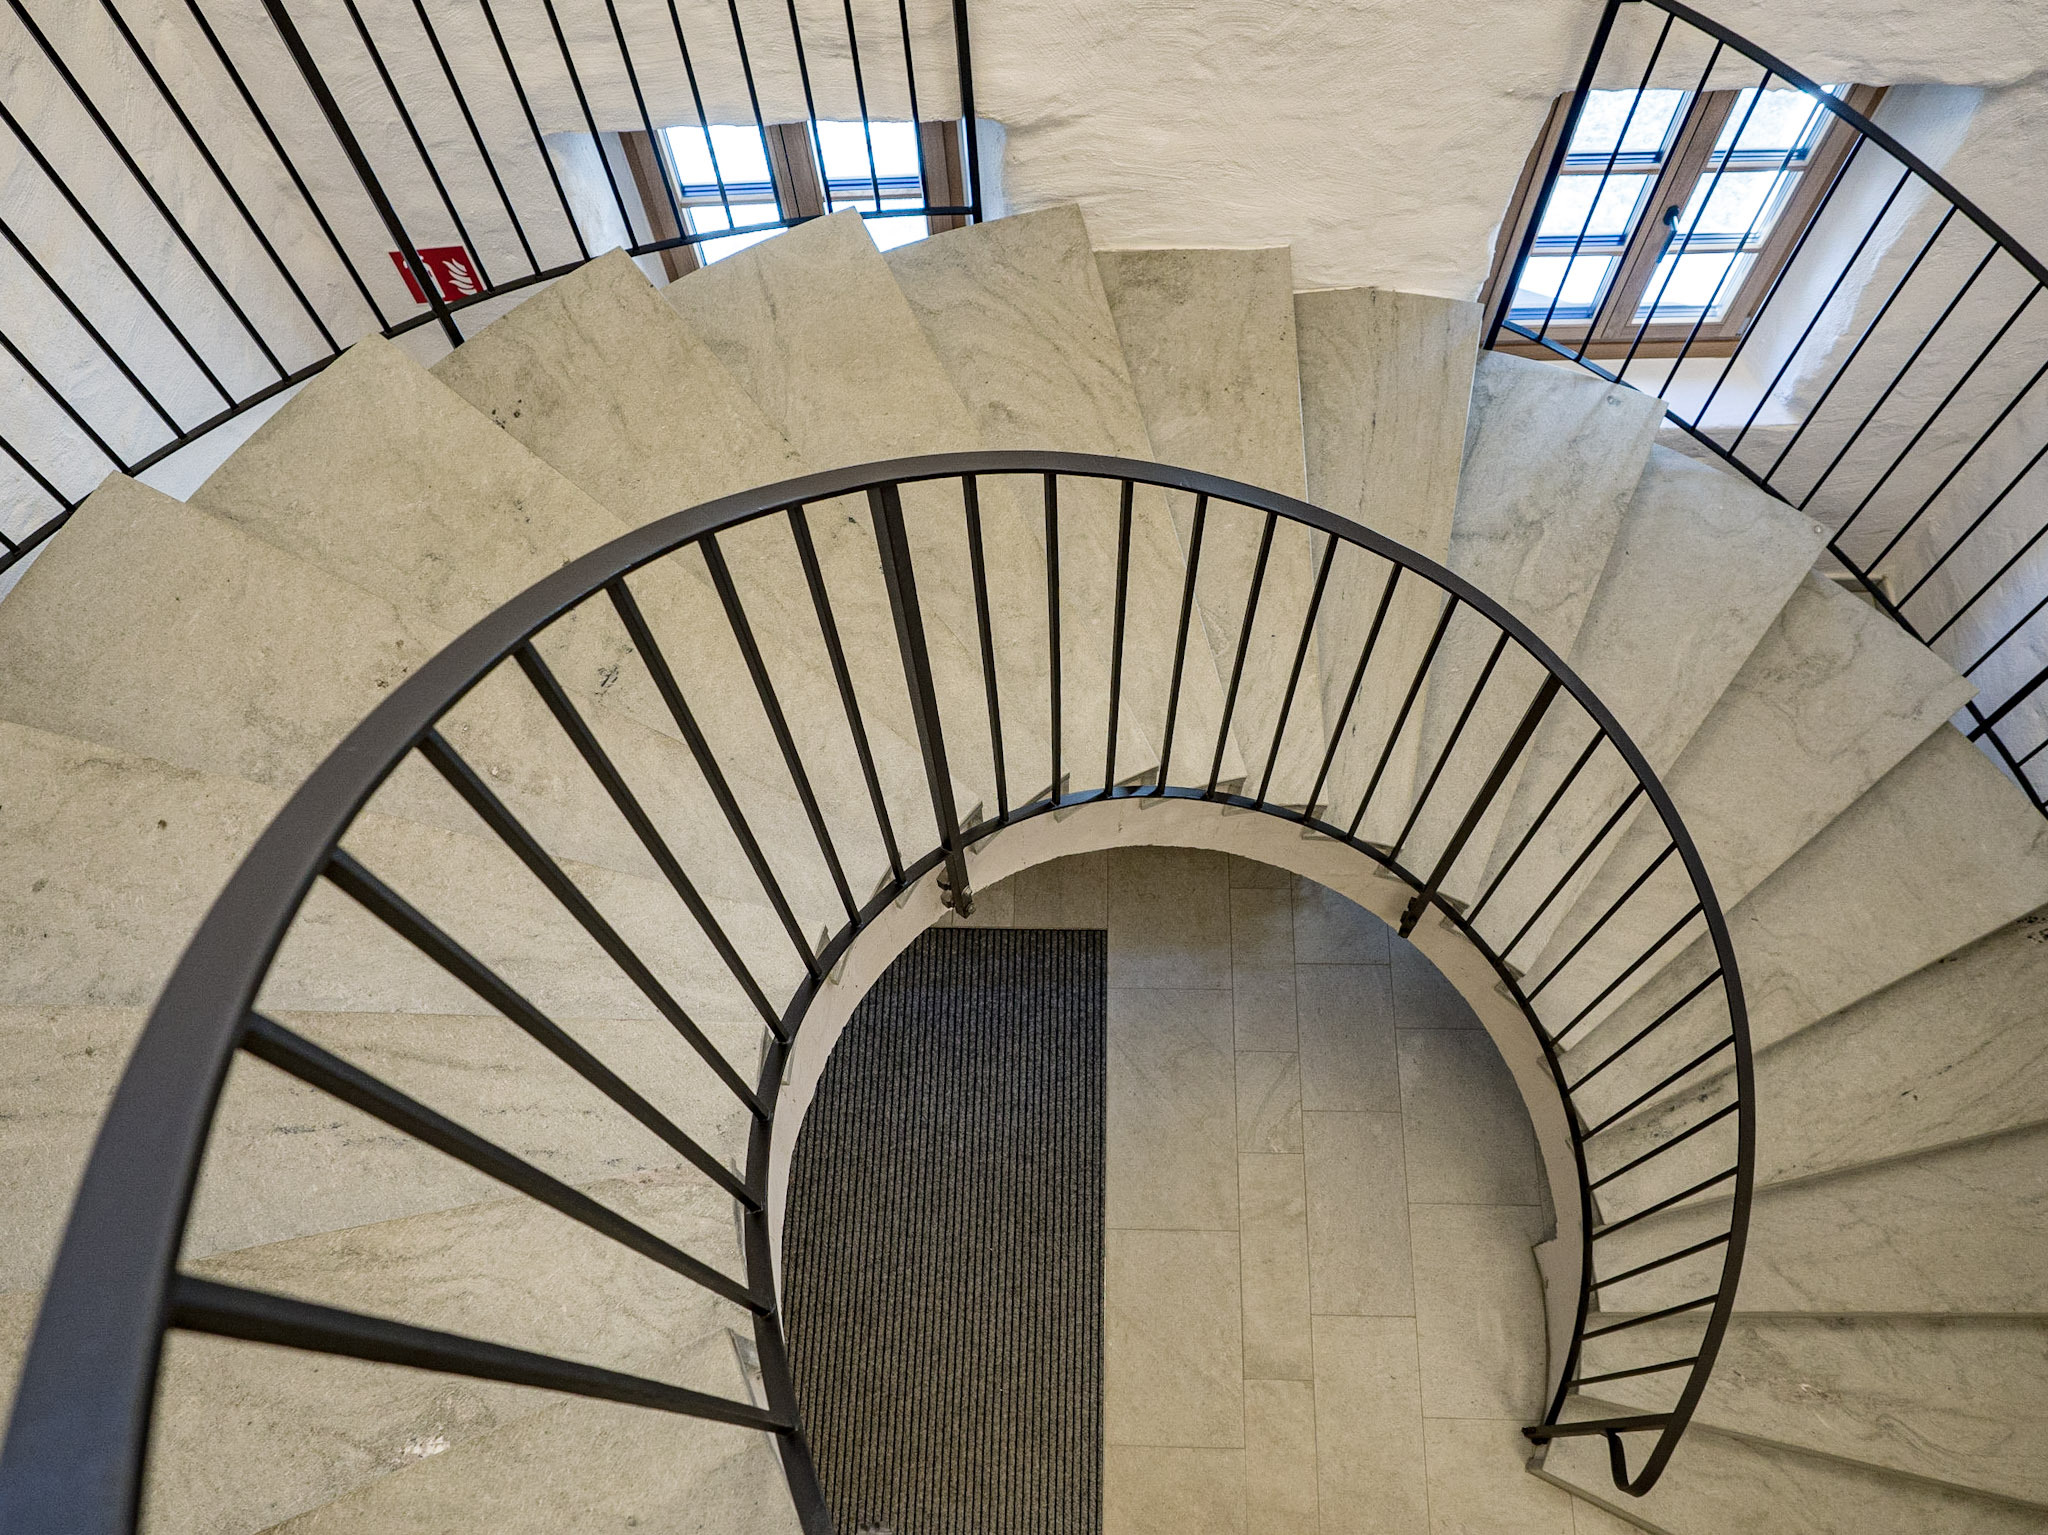 Edle Steintreppen führen ins obere Geschoss - barrierefrei geht es mit dem Lift